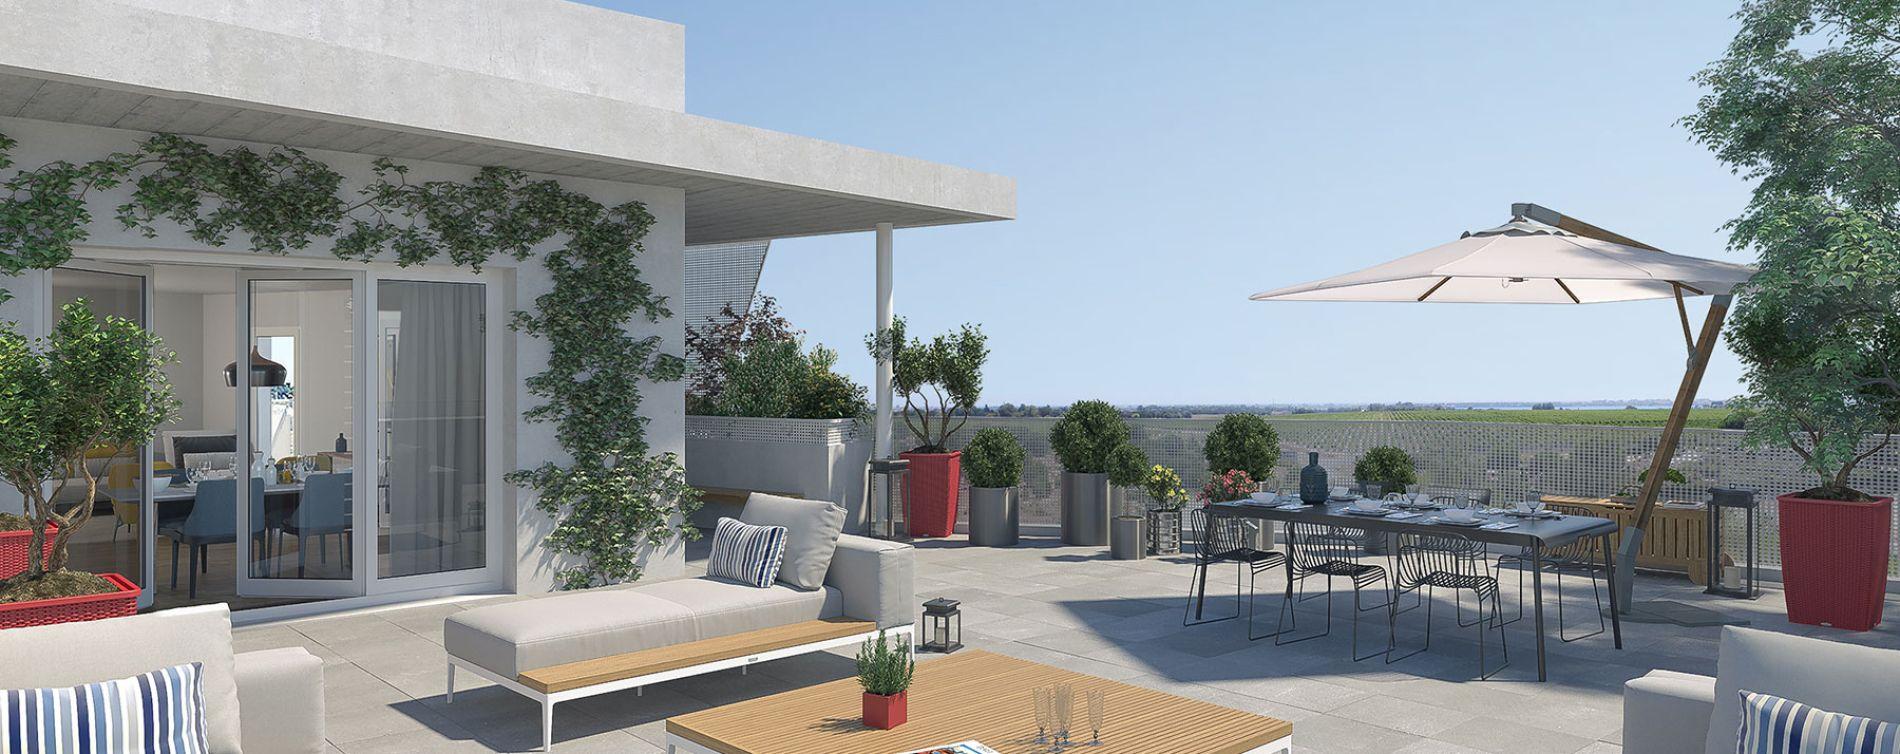 Lattes : programme immobilier neuve « Mira » (3)